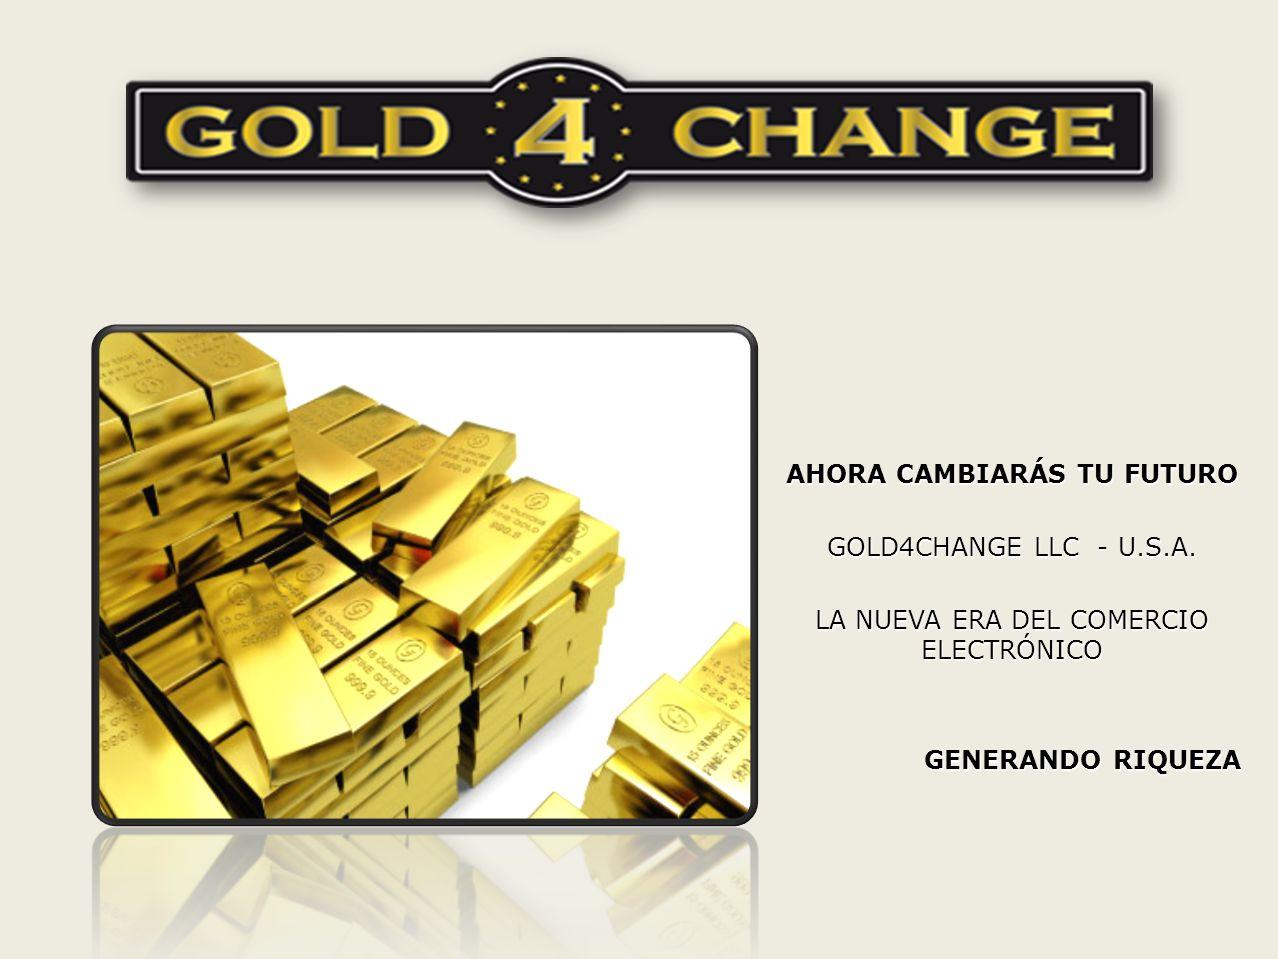 AHORA CAMBIARÁS TU FUTURO GOLD4CHANGE LLC - U.S.A.